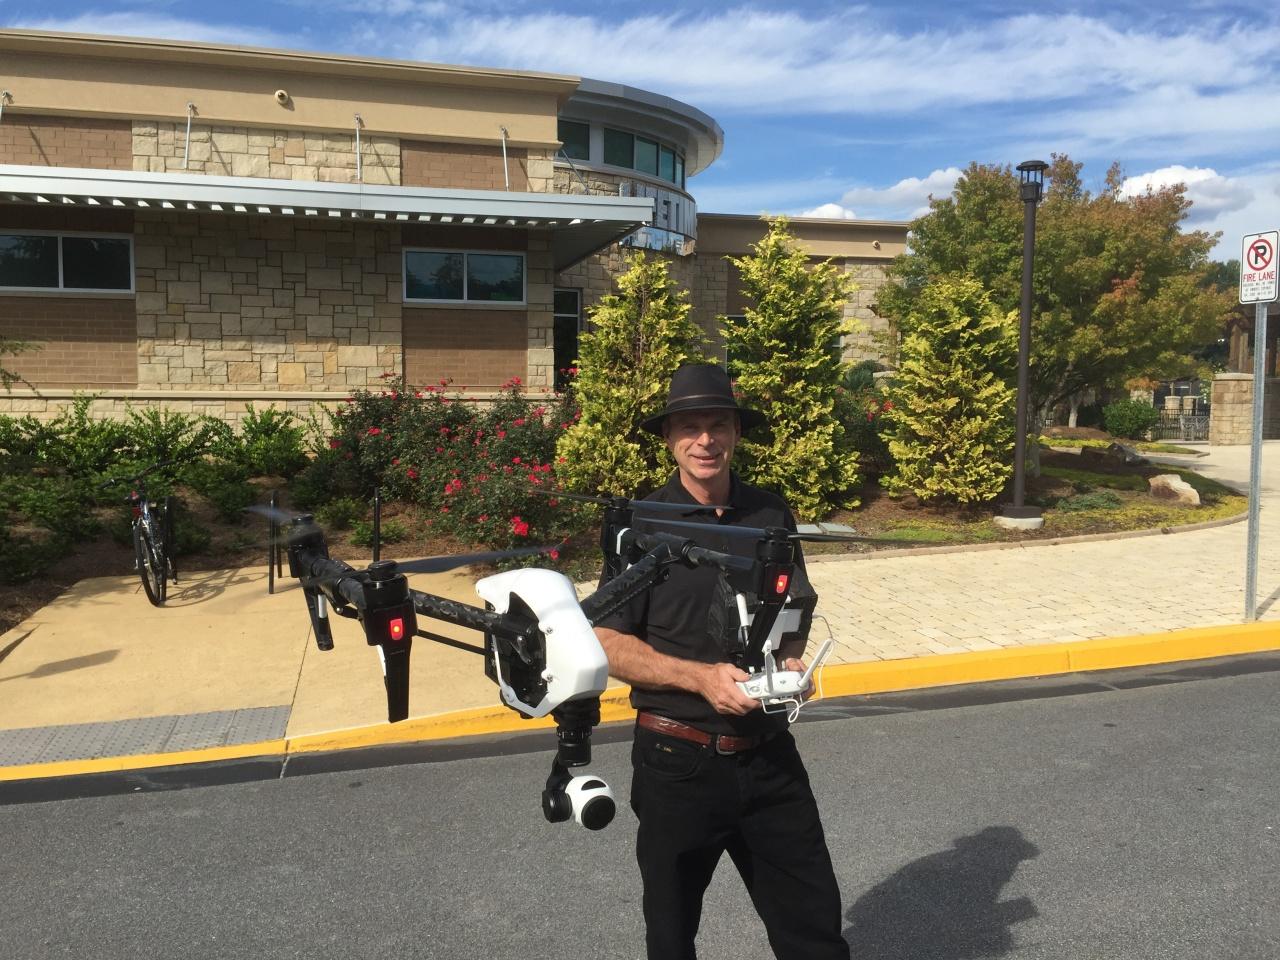 Drone Operator, Videographer